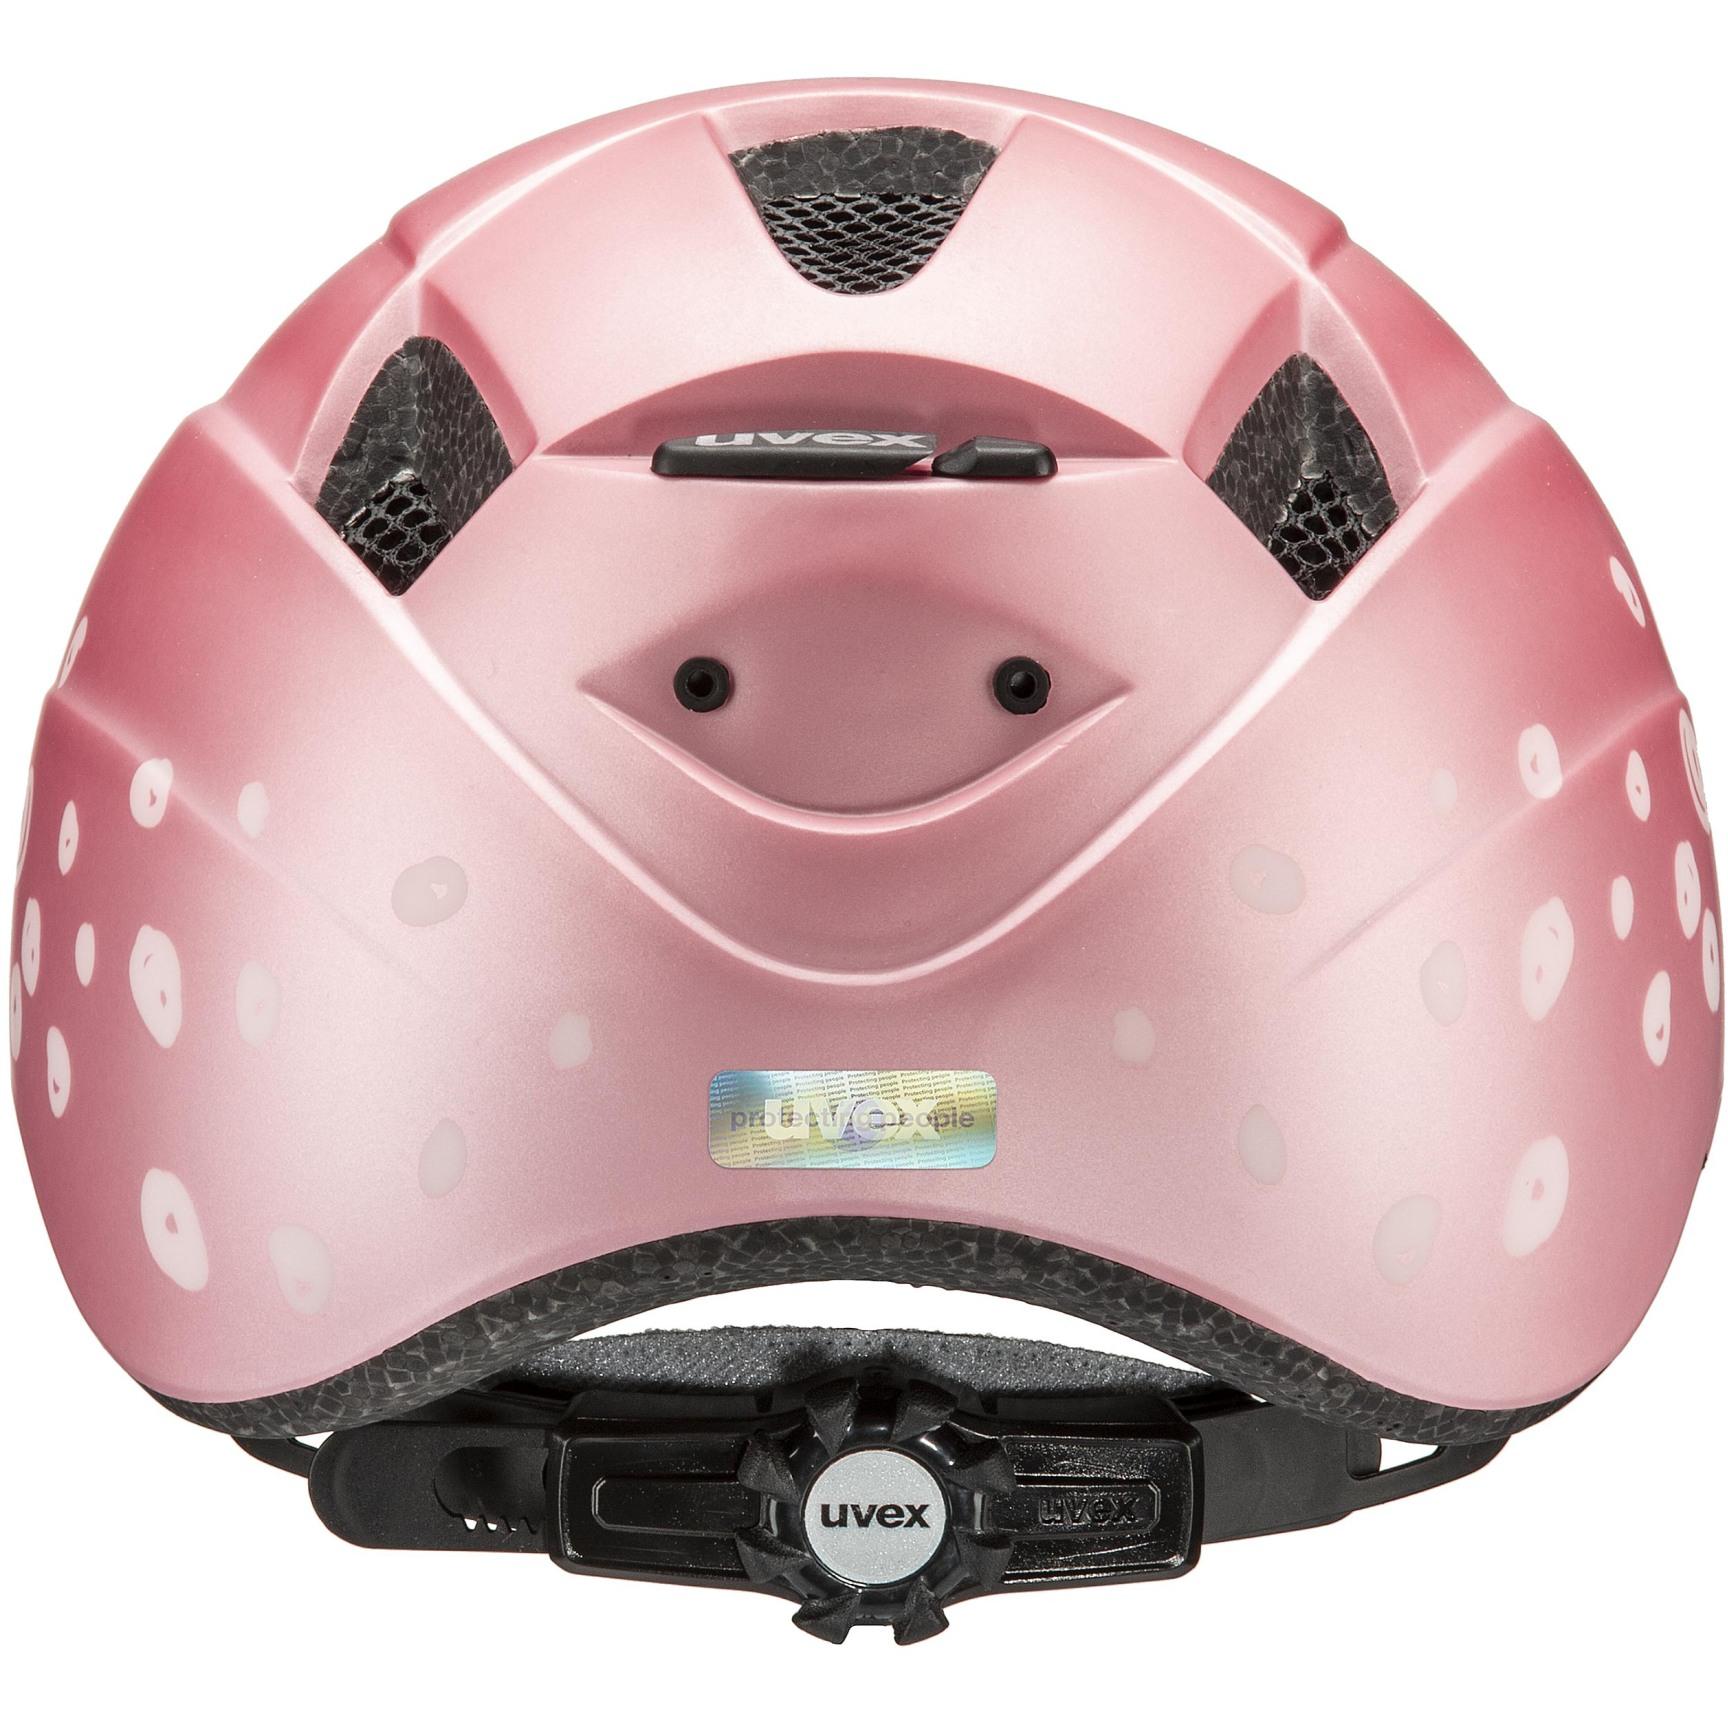 Image of Uvex kid 2 cc Kids Helmet - pink polka dots